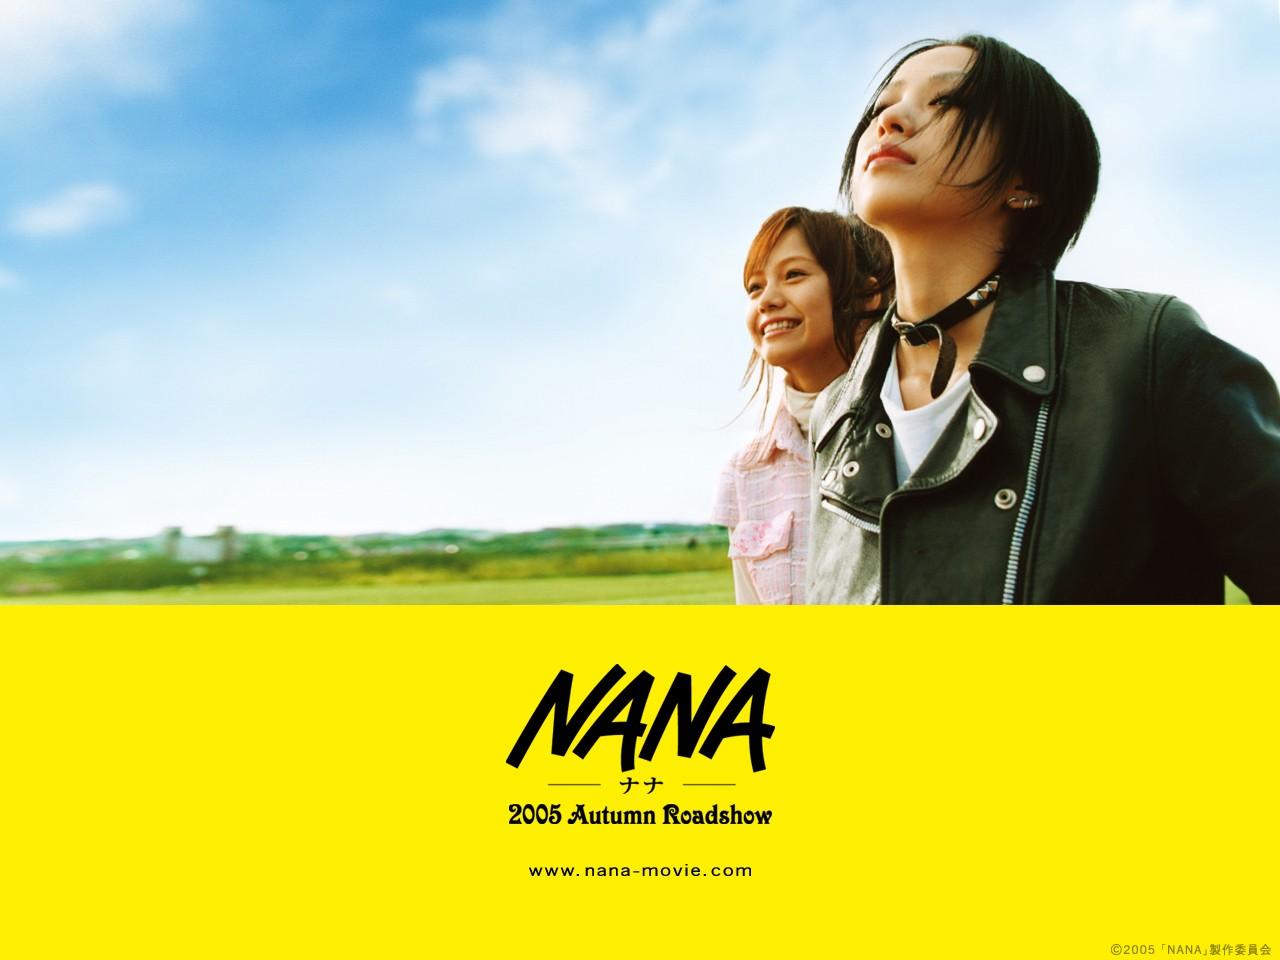 Yui Ichikawa (Nana Osaki) e Mika Nakashima (Nana Komatsu) in un wallpaper del film Nana